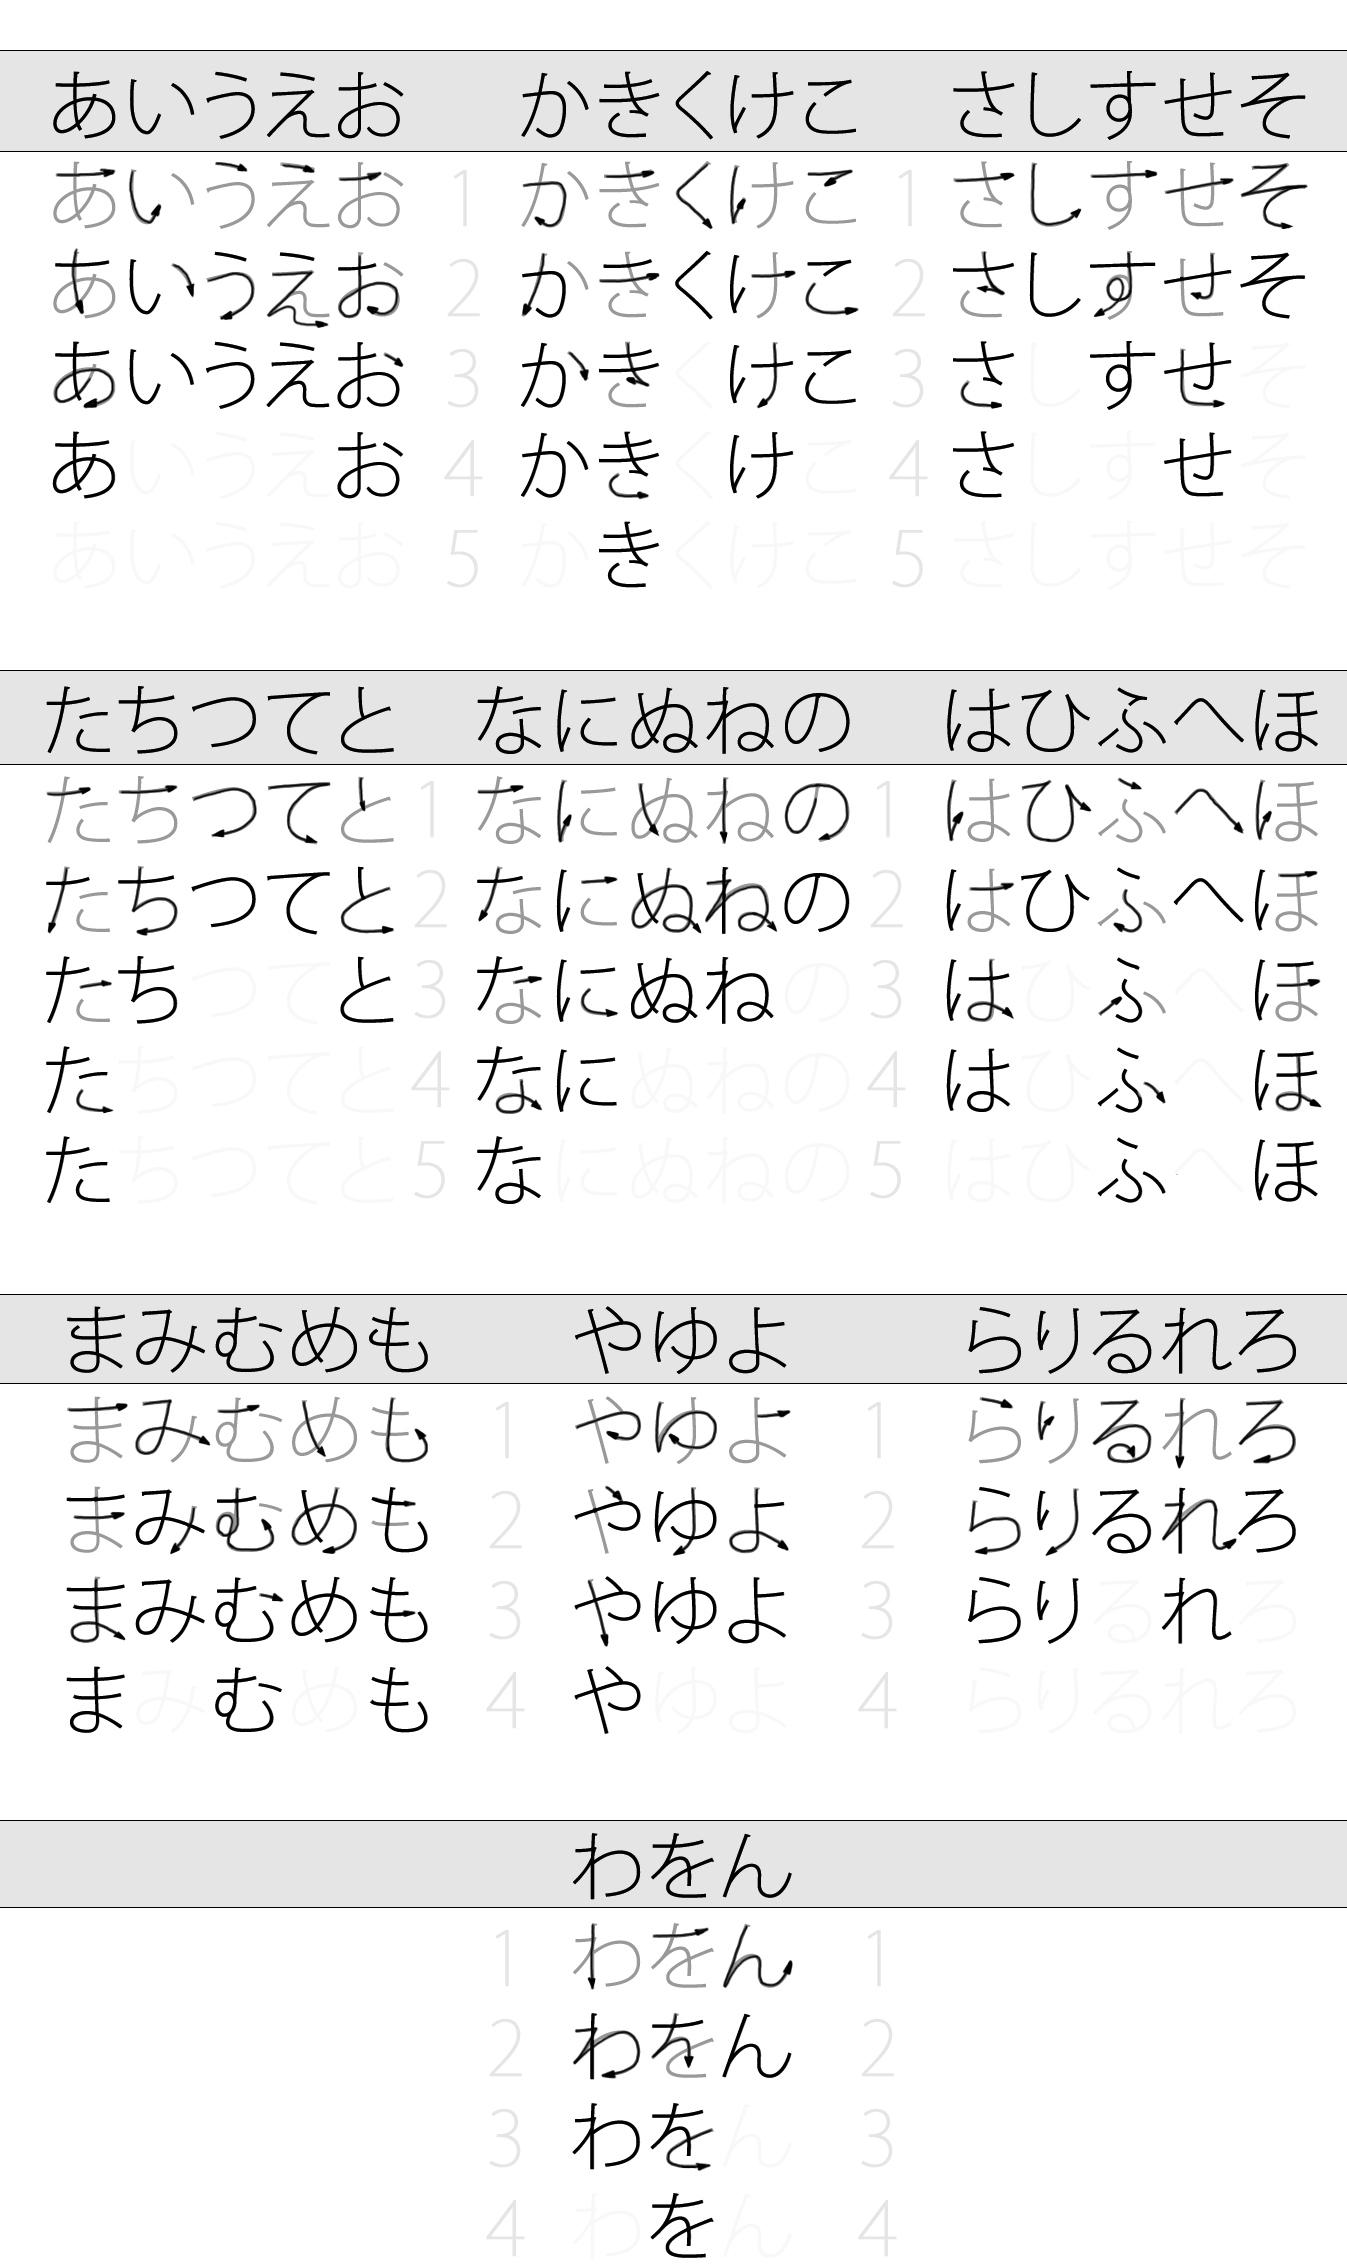 Nihongoresources